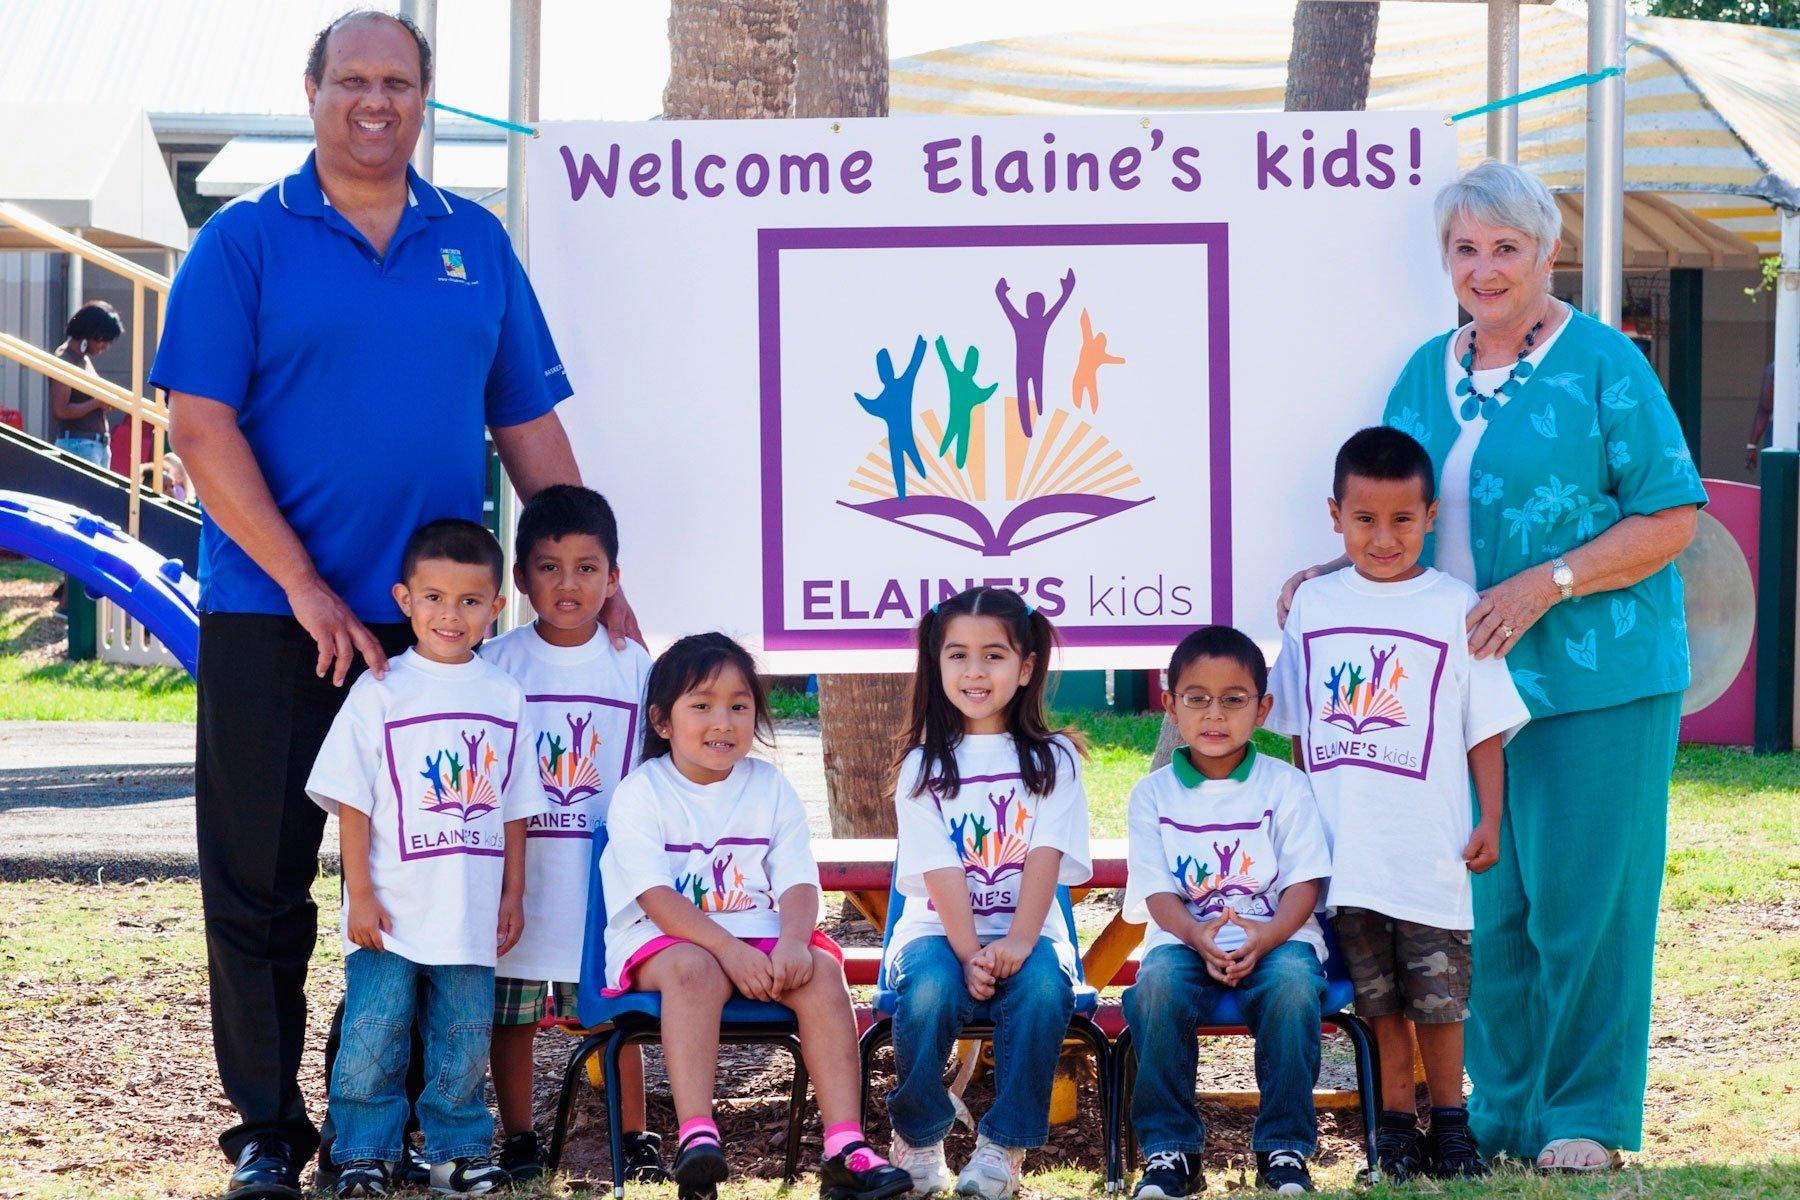 Elaine's Kids